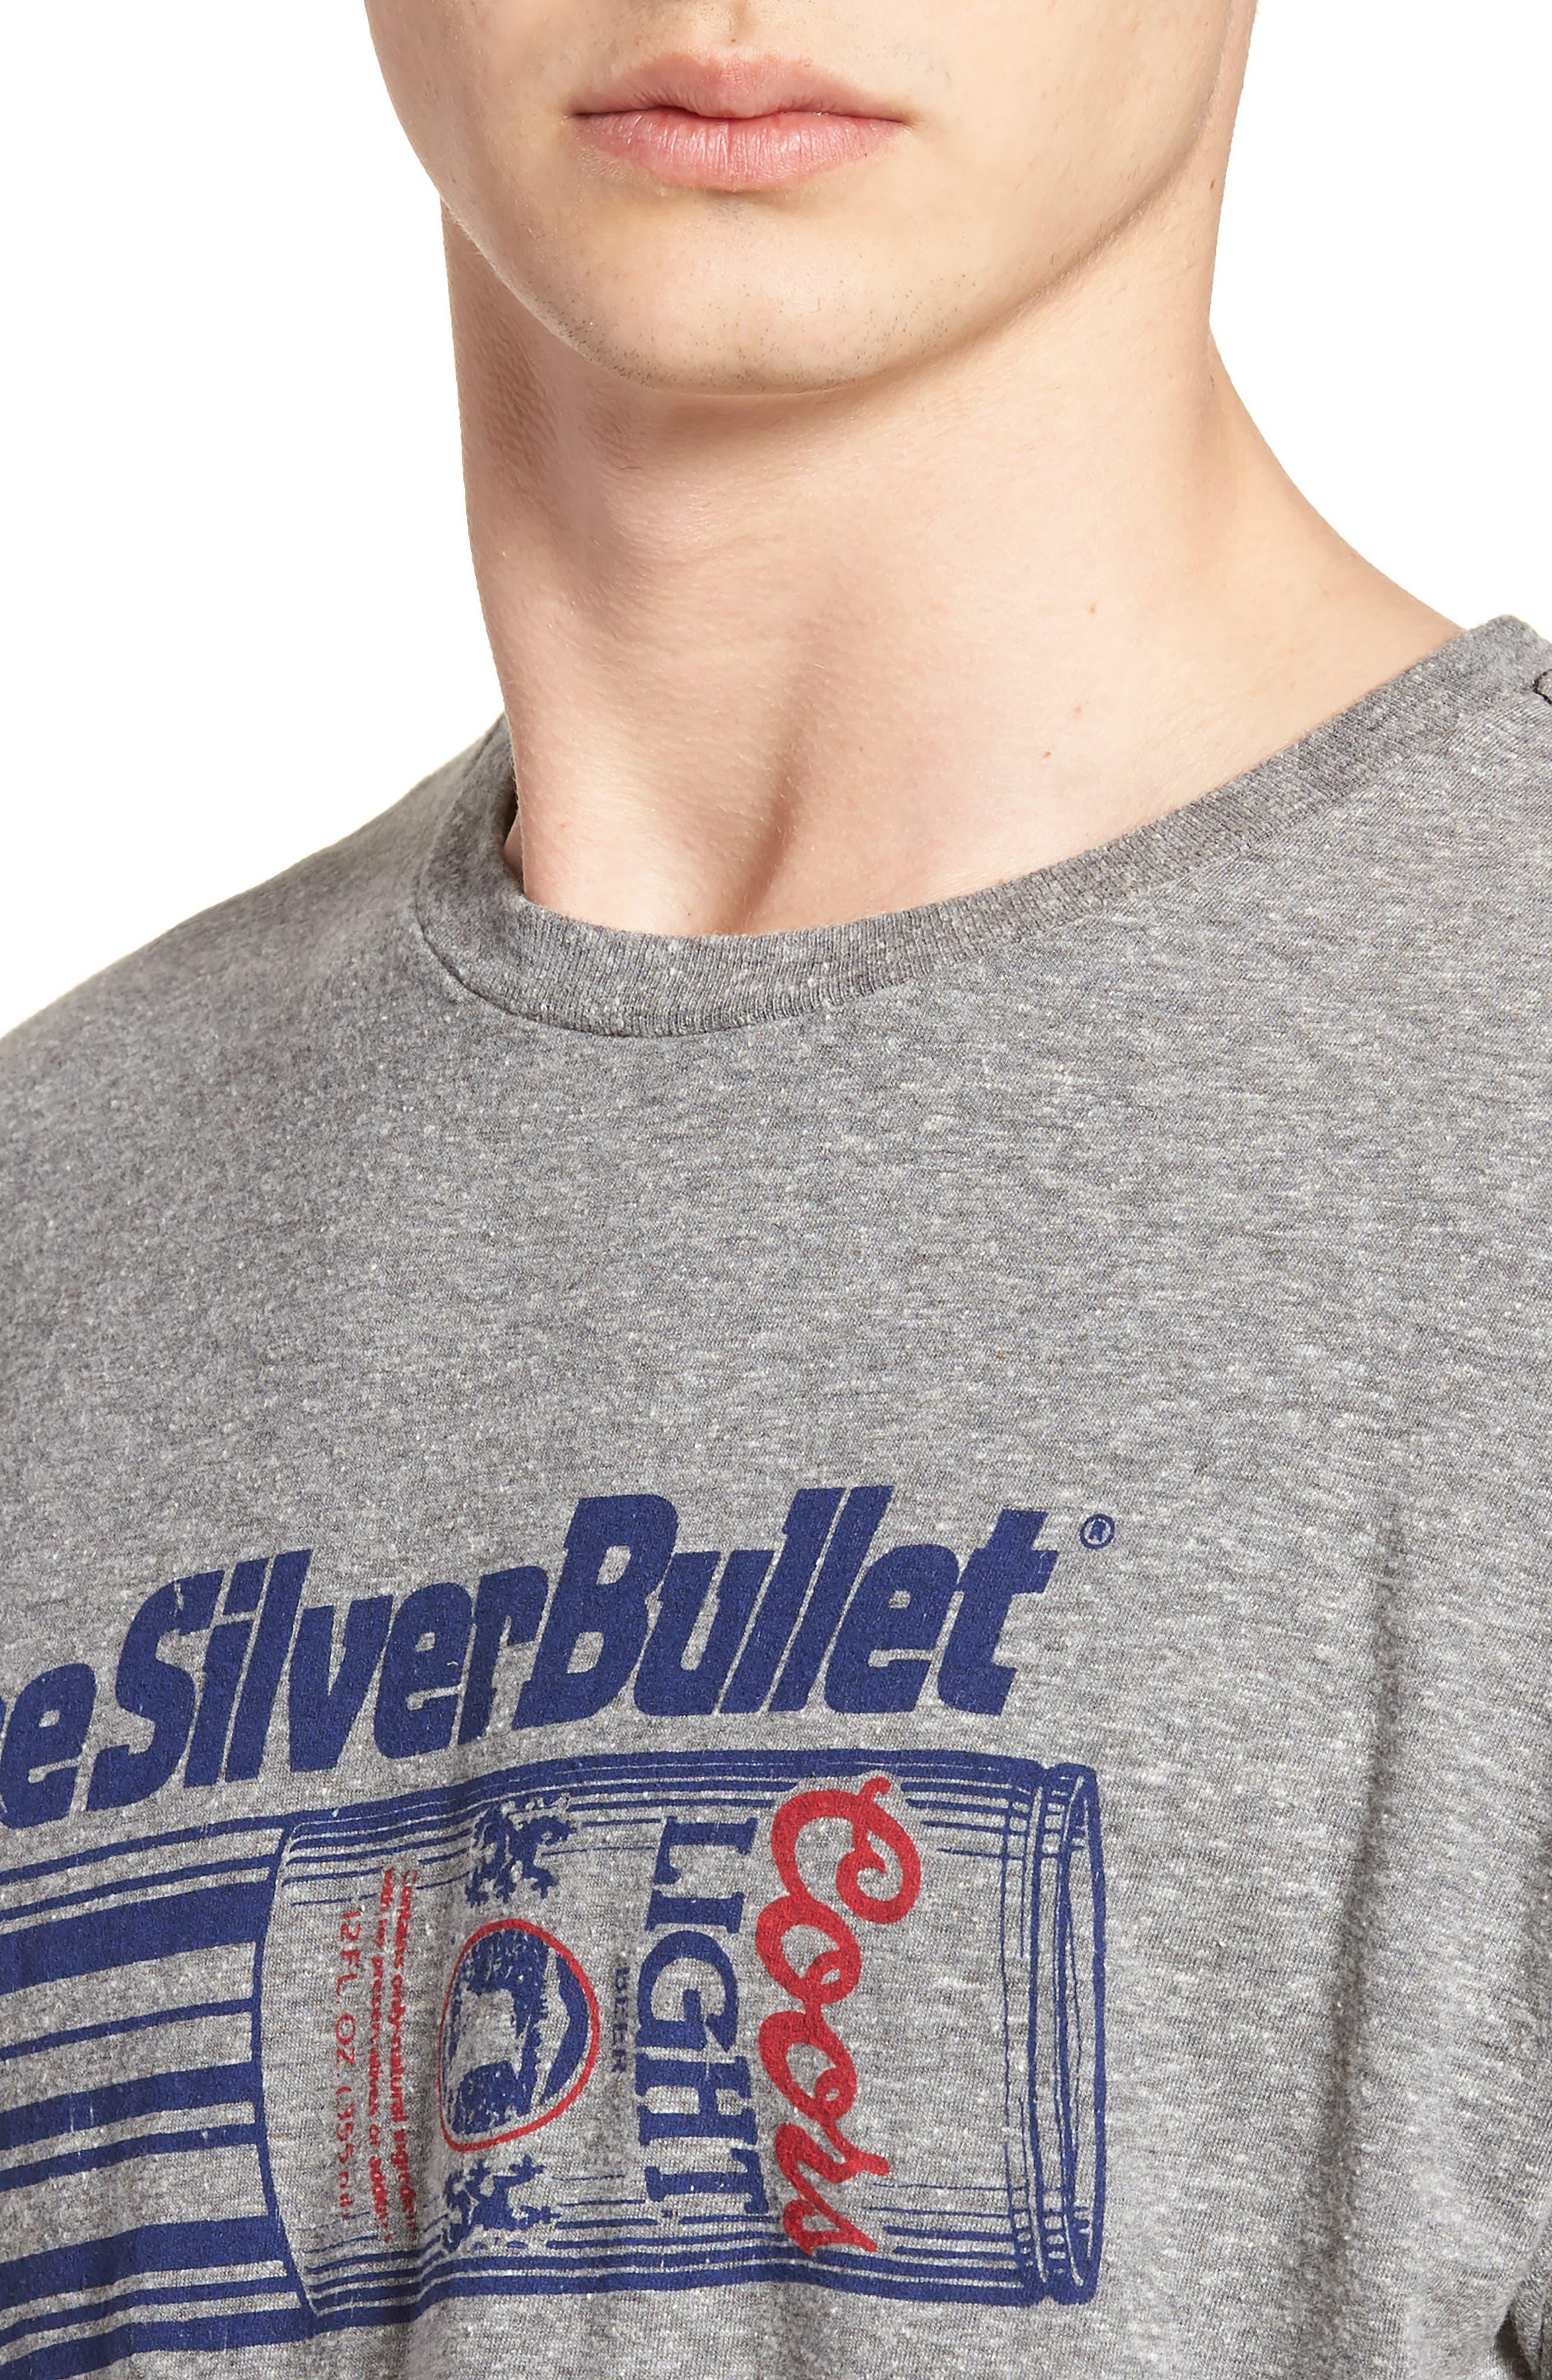 RETRO BRAND,                             Original Retro Brand Silver Bullet Graphic T-Shirt,                             Alternate thumbnail 4, color,                             020